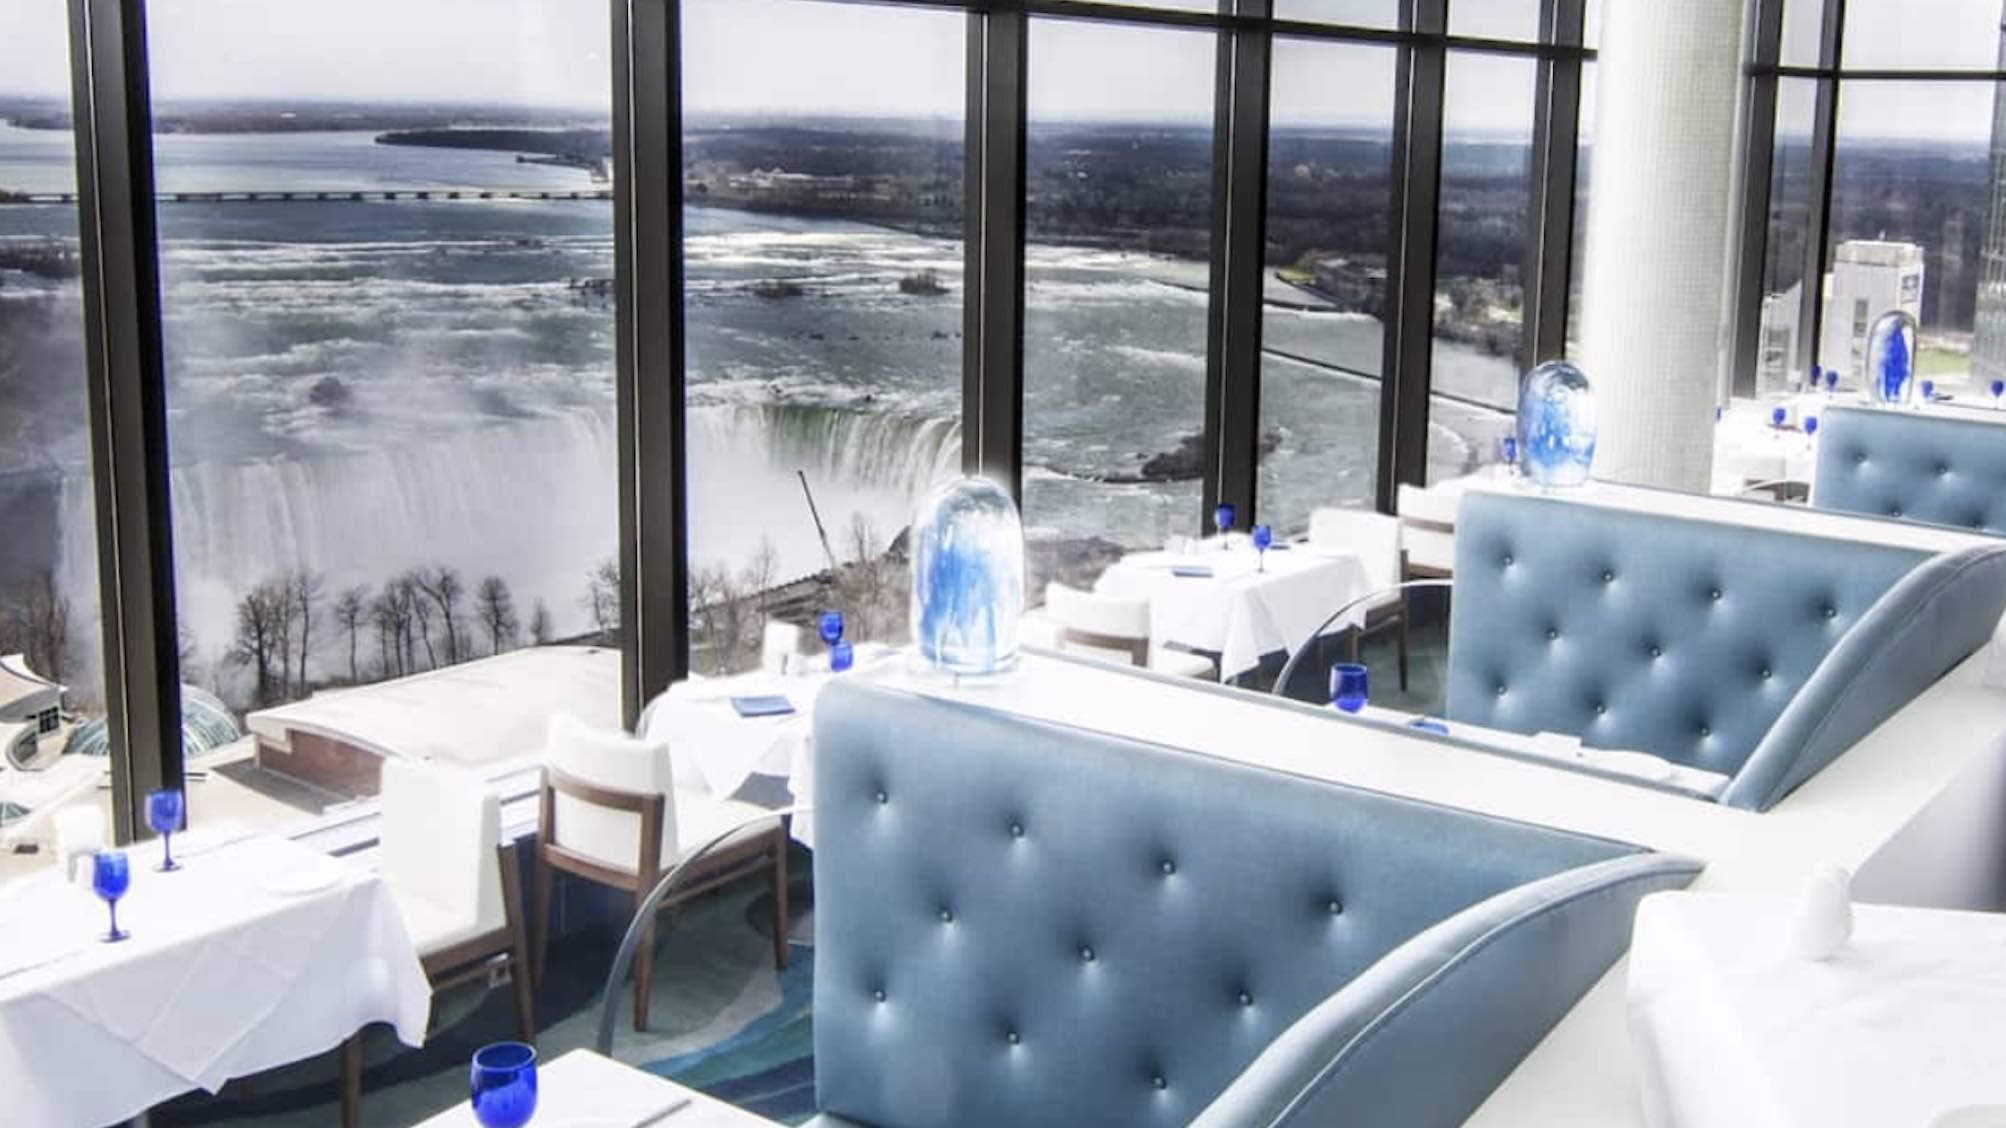 Hilton Niagara Falls:Fallsview Hotel & Suites luxury hotels in niagara falls restaurant seating with falls view